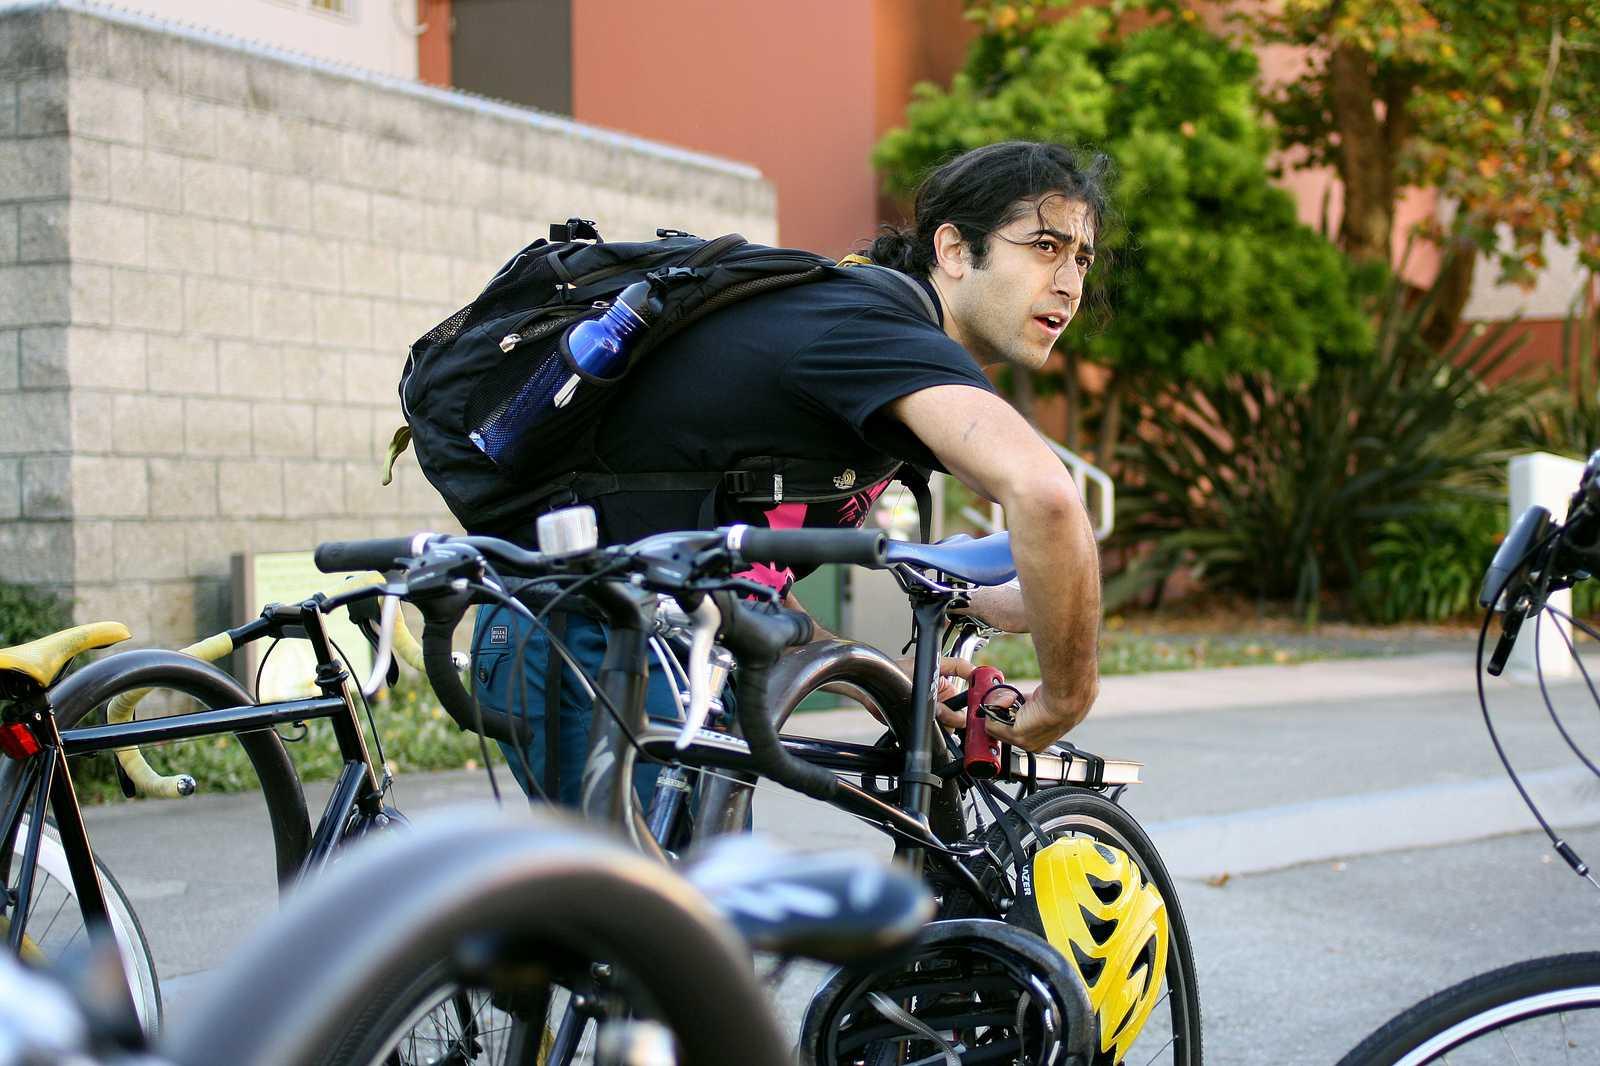 Shervin Sahba locks up his bike between Humanities and Creative Arts buildings Oct. 7, 2013. Photo by Tony Santos / Xpress